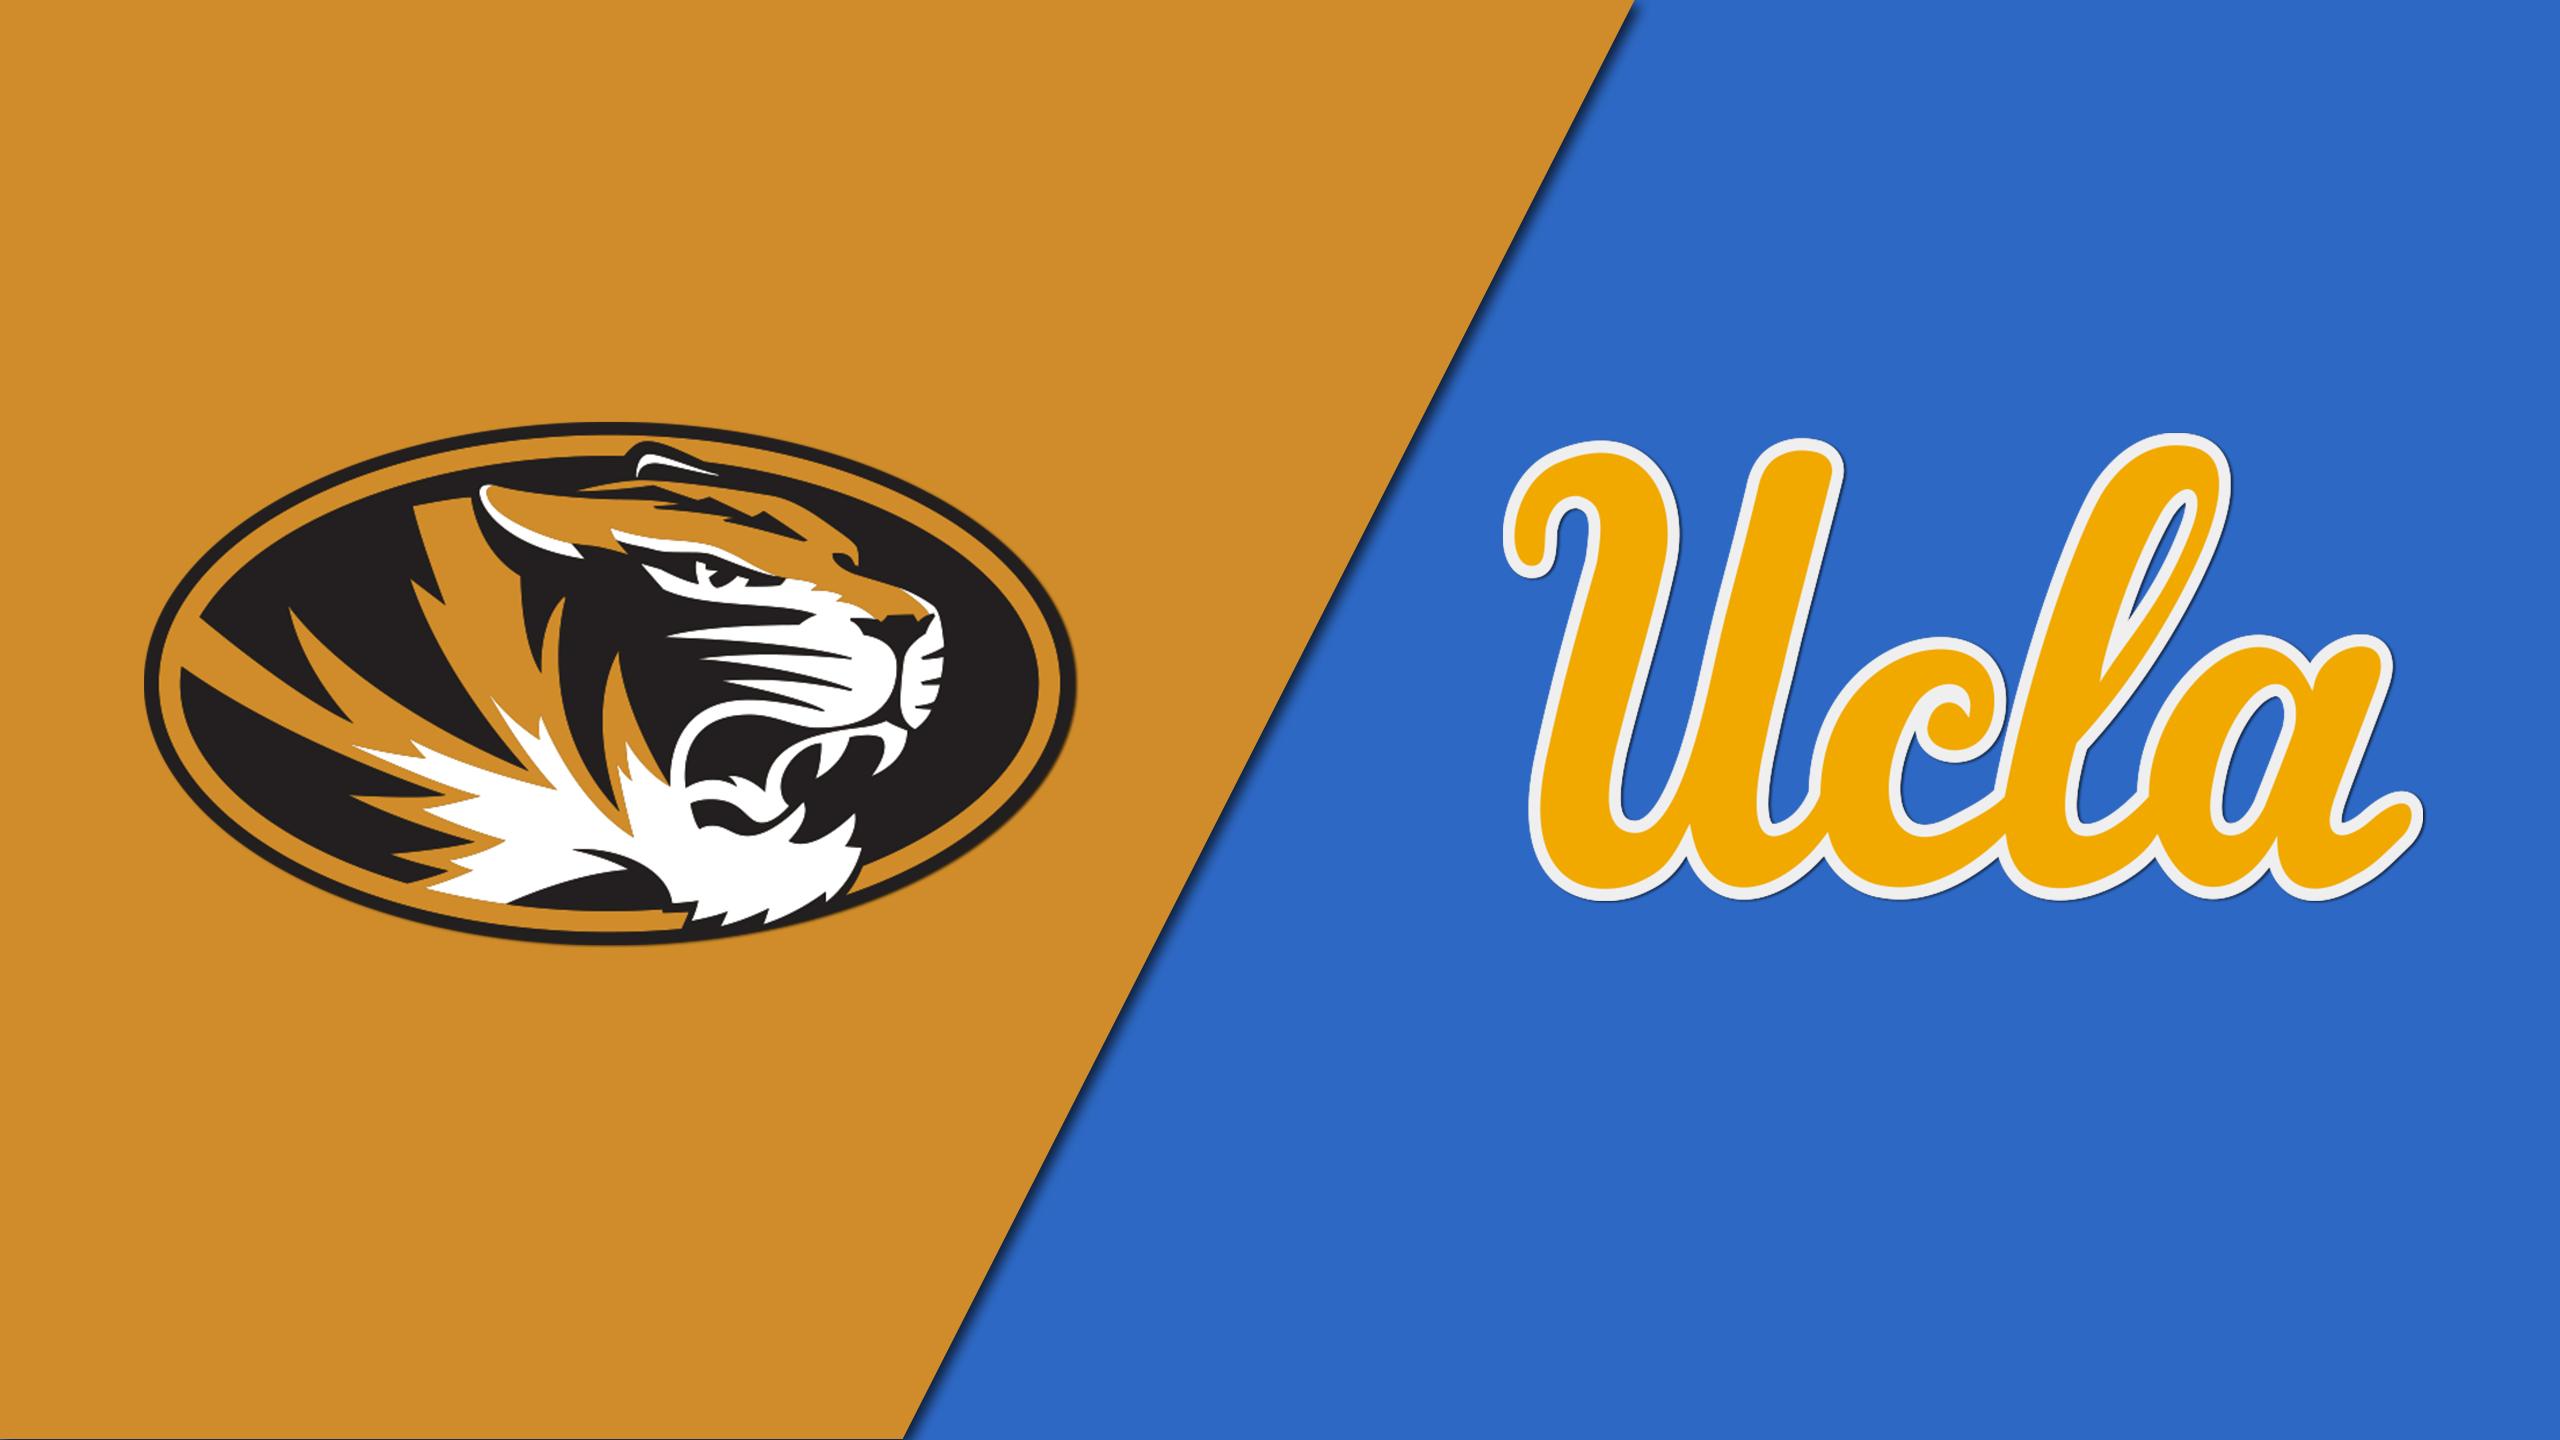 Missouri vs. UCLA (Site 8 / Game 7) (re-air)